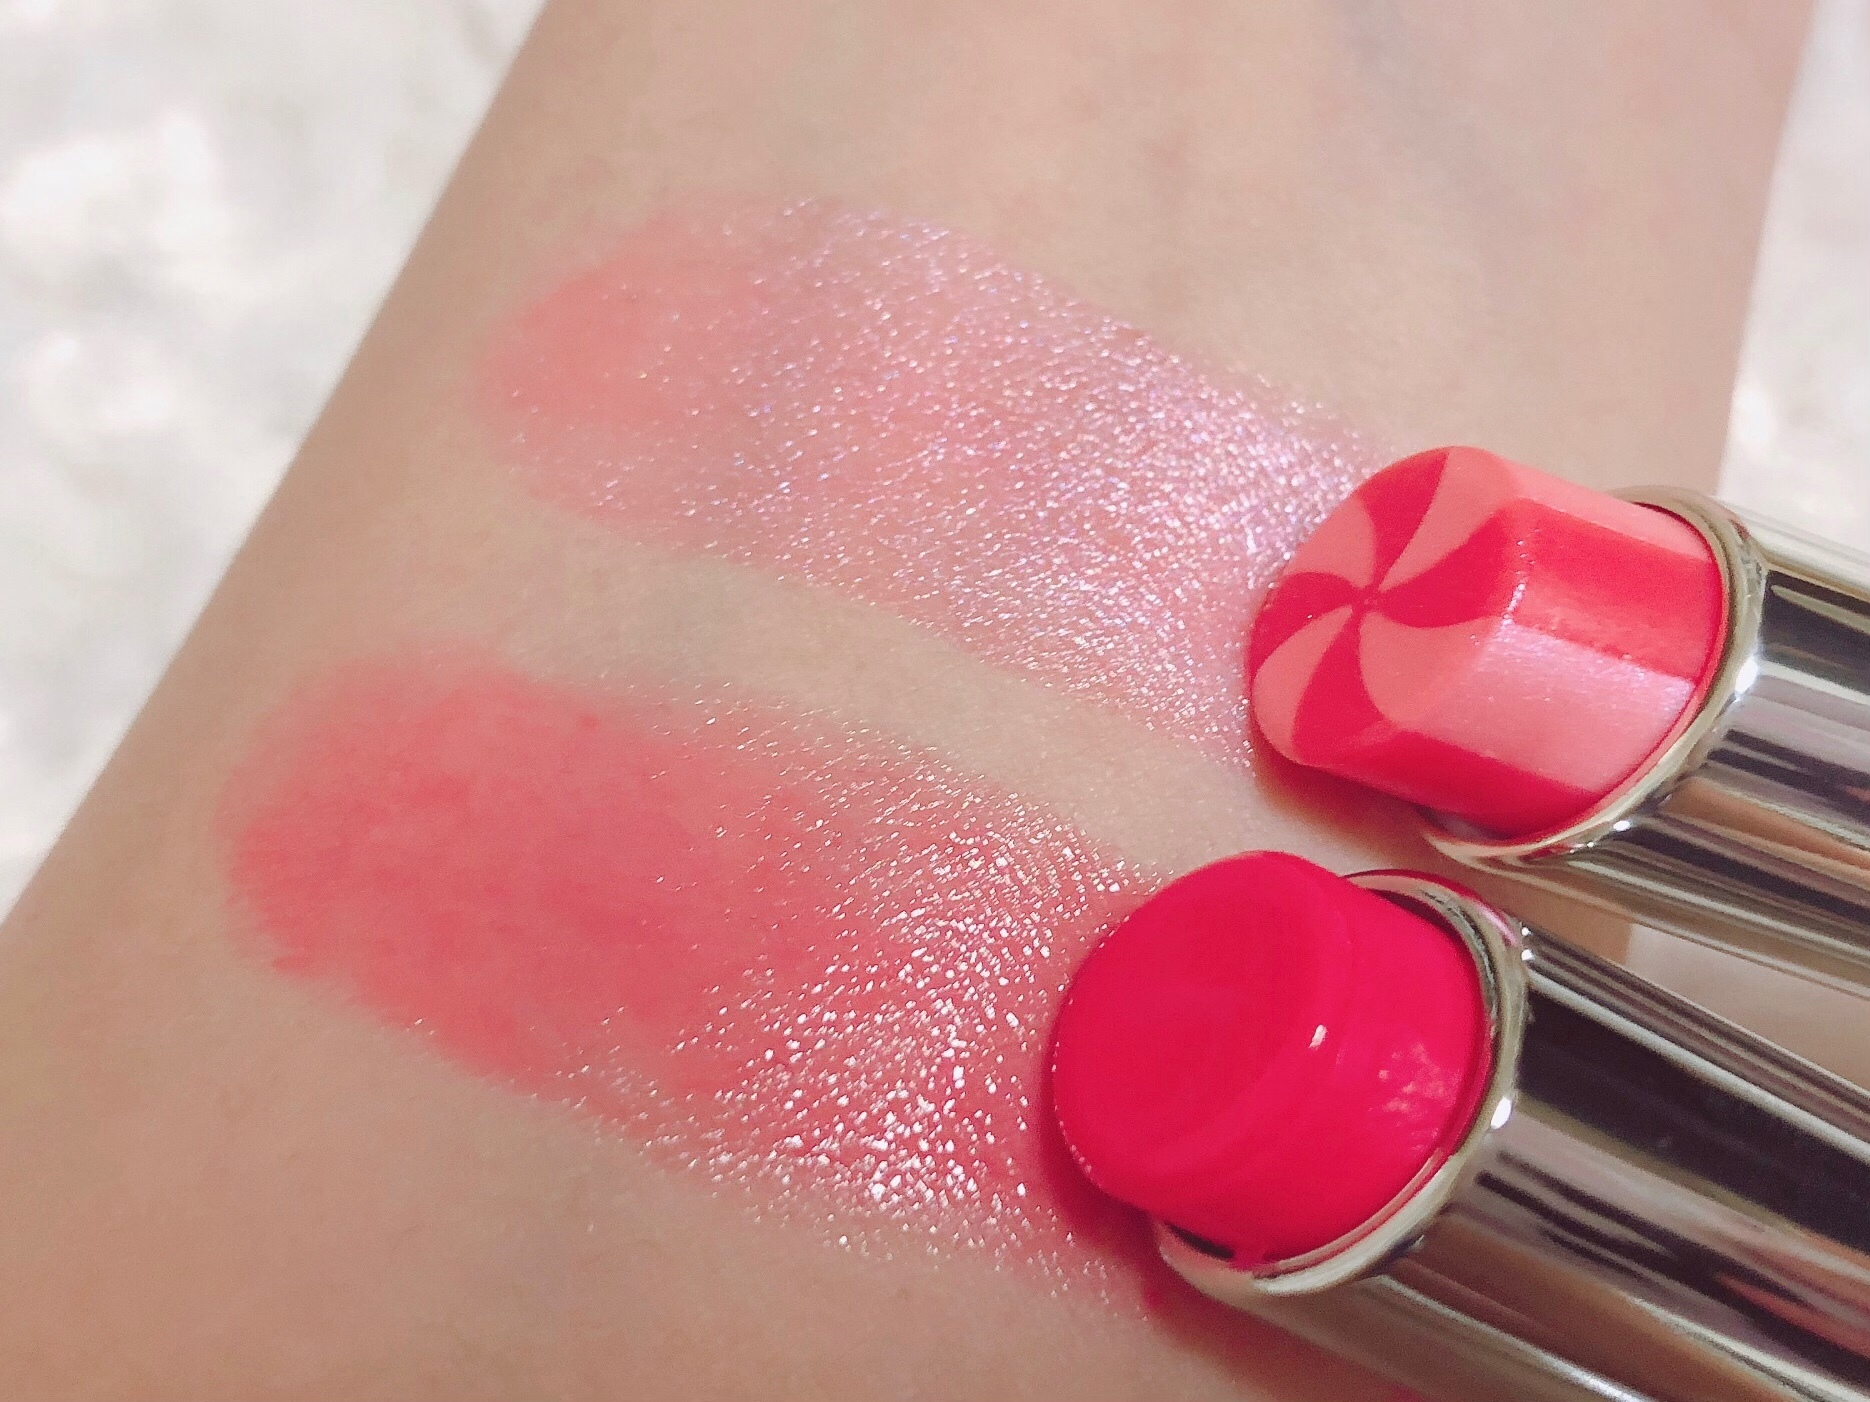 【Dior】大量購入!つるつる肌を作れる最強アイテムも❤︎_1_3